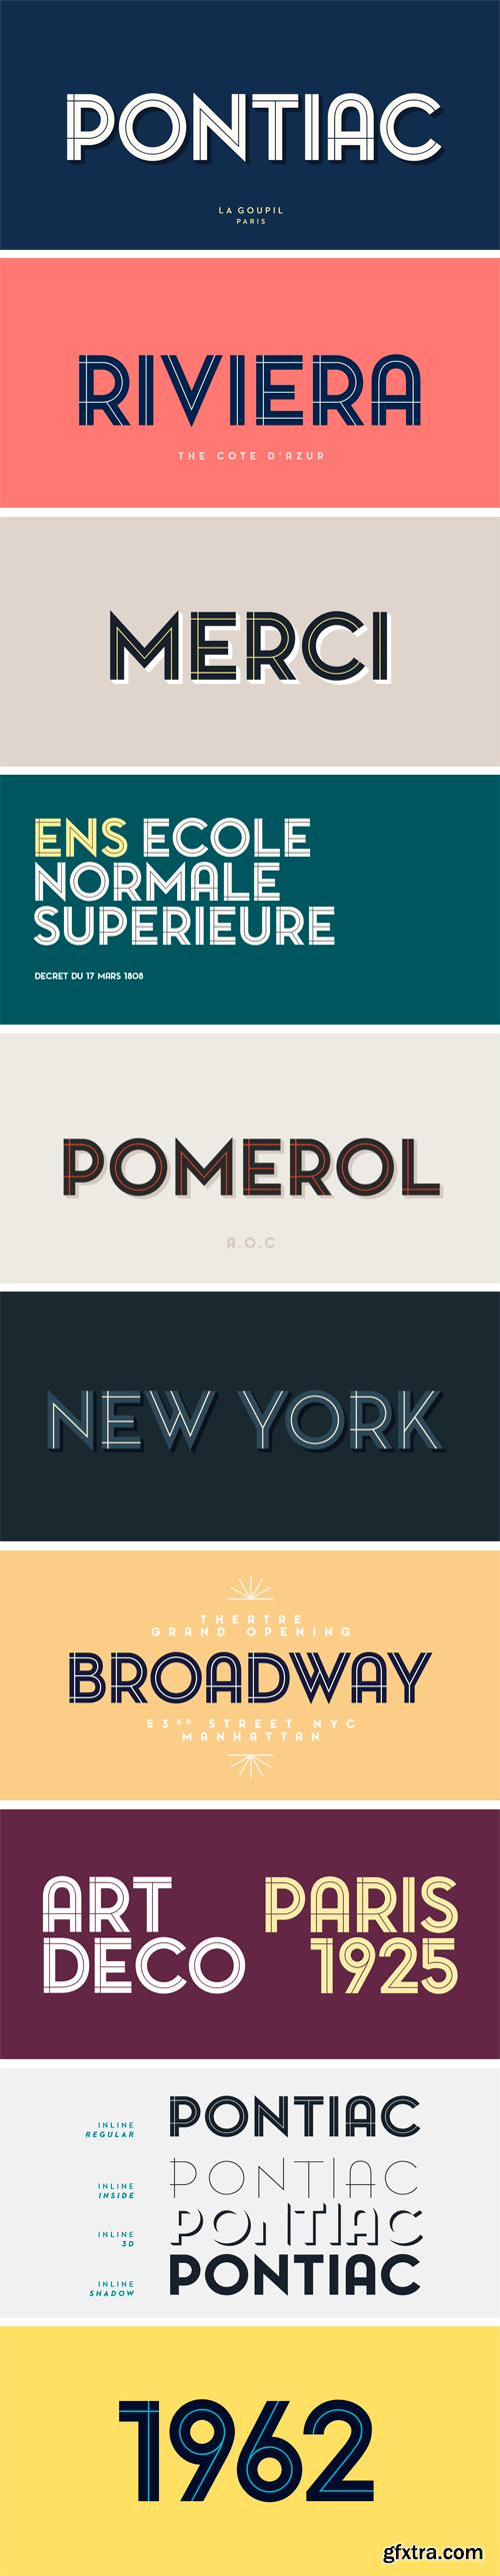 Pontiac Inline Font Family - 4 Fonts $15